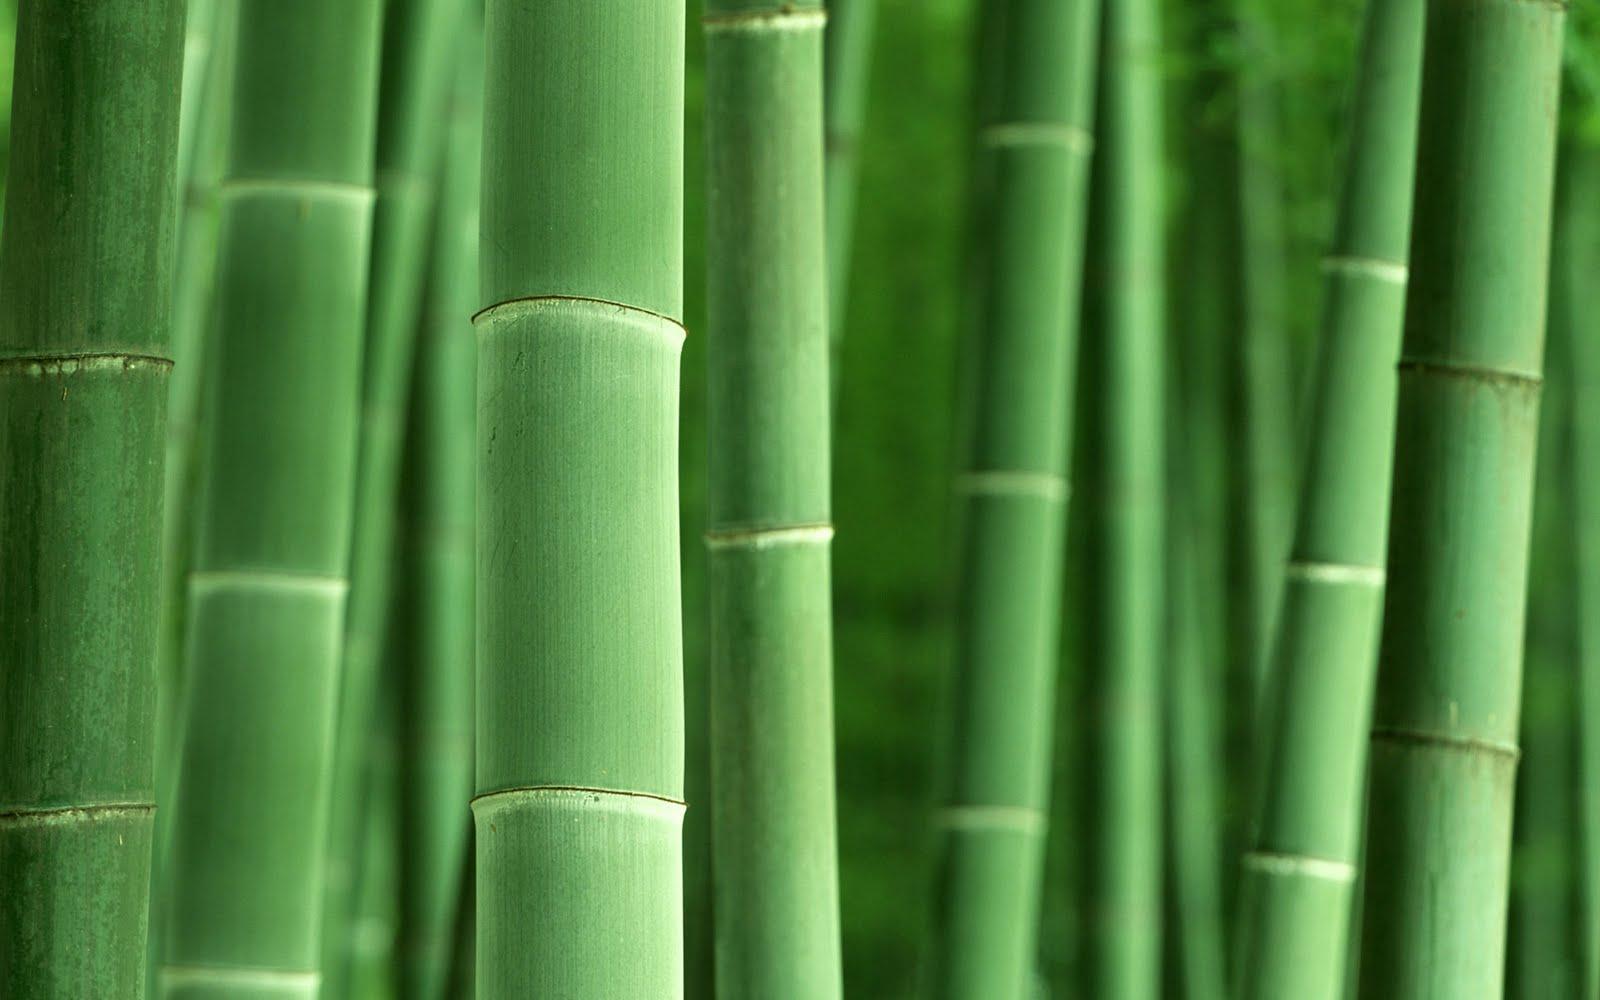 http://3.bp.blogspot.com/_QkWfBvmBstU/S-C31H9MOsI/AAAAAAAAAZQ/iKIs3H5L8gY/s1600/bamboo+1920x1200-6.jpg